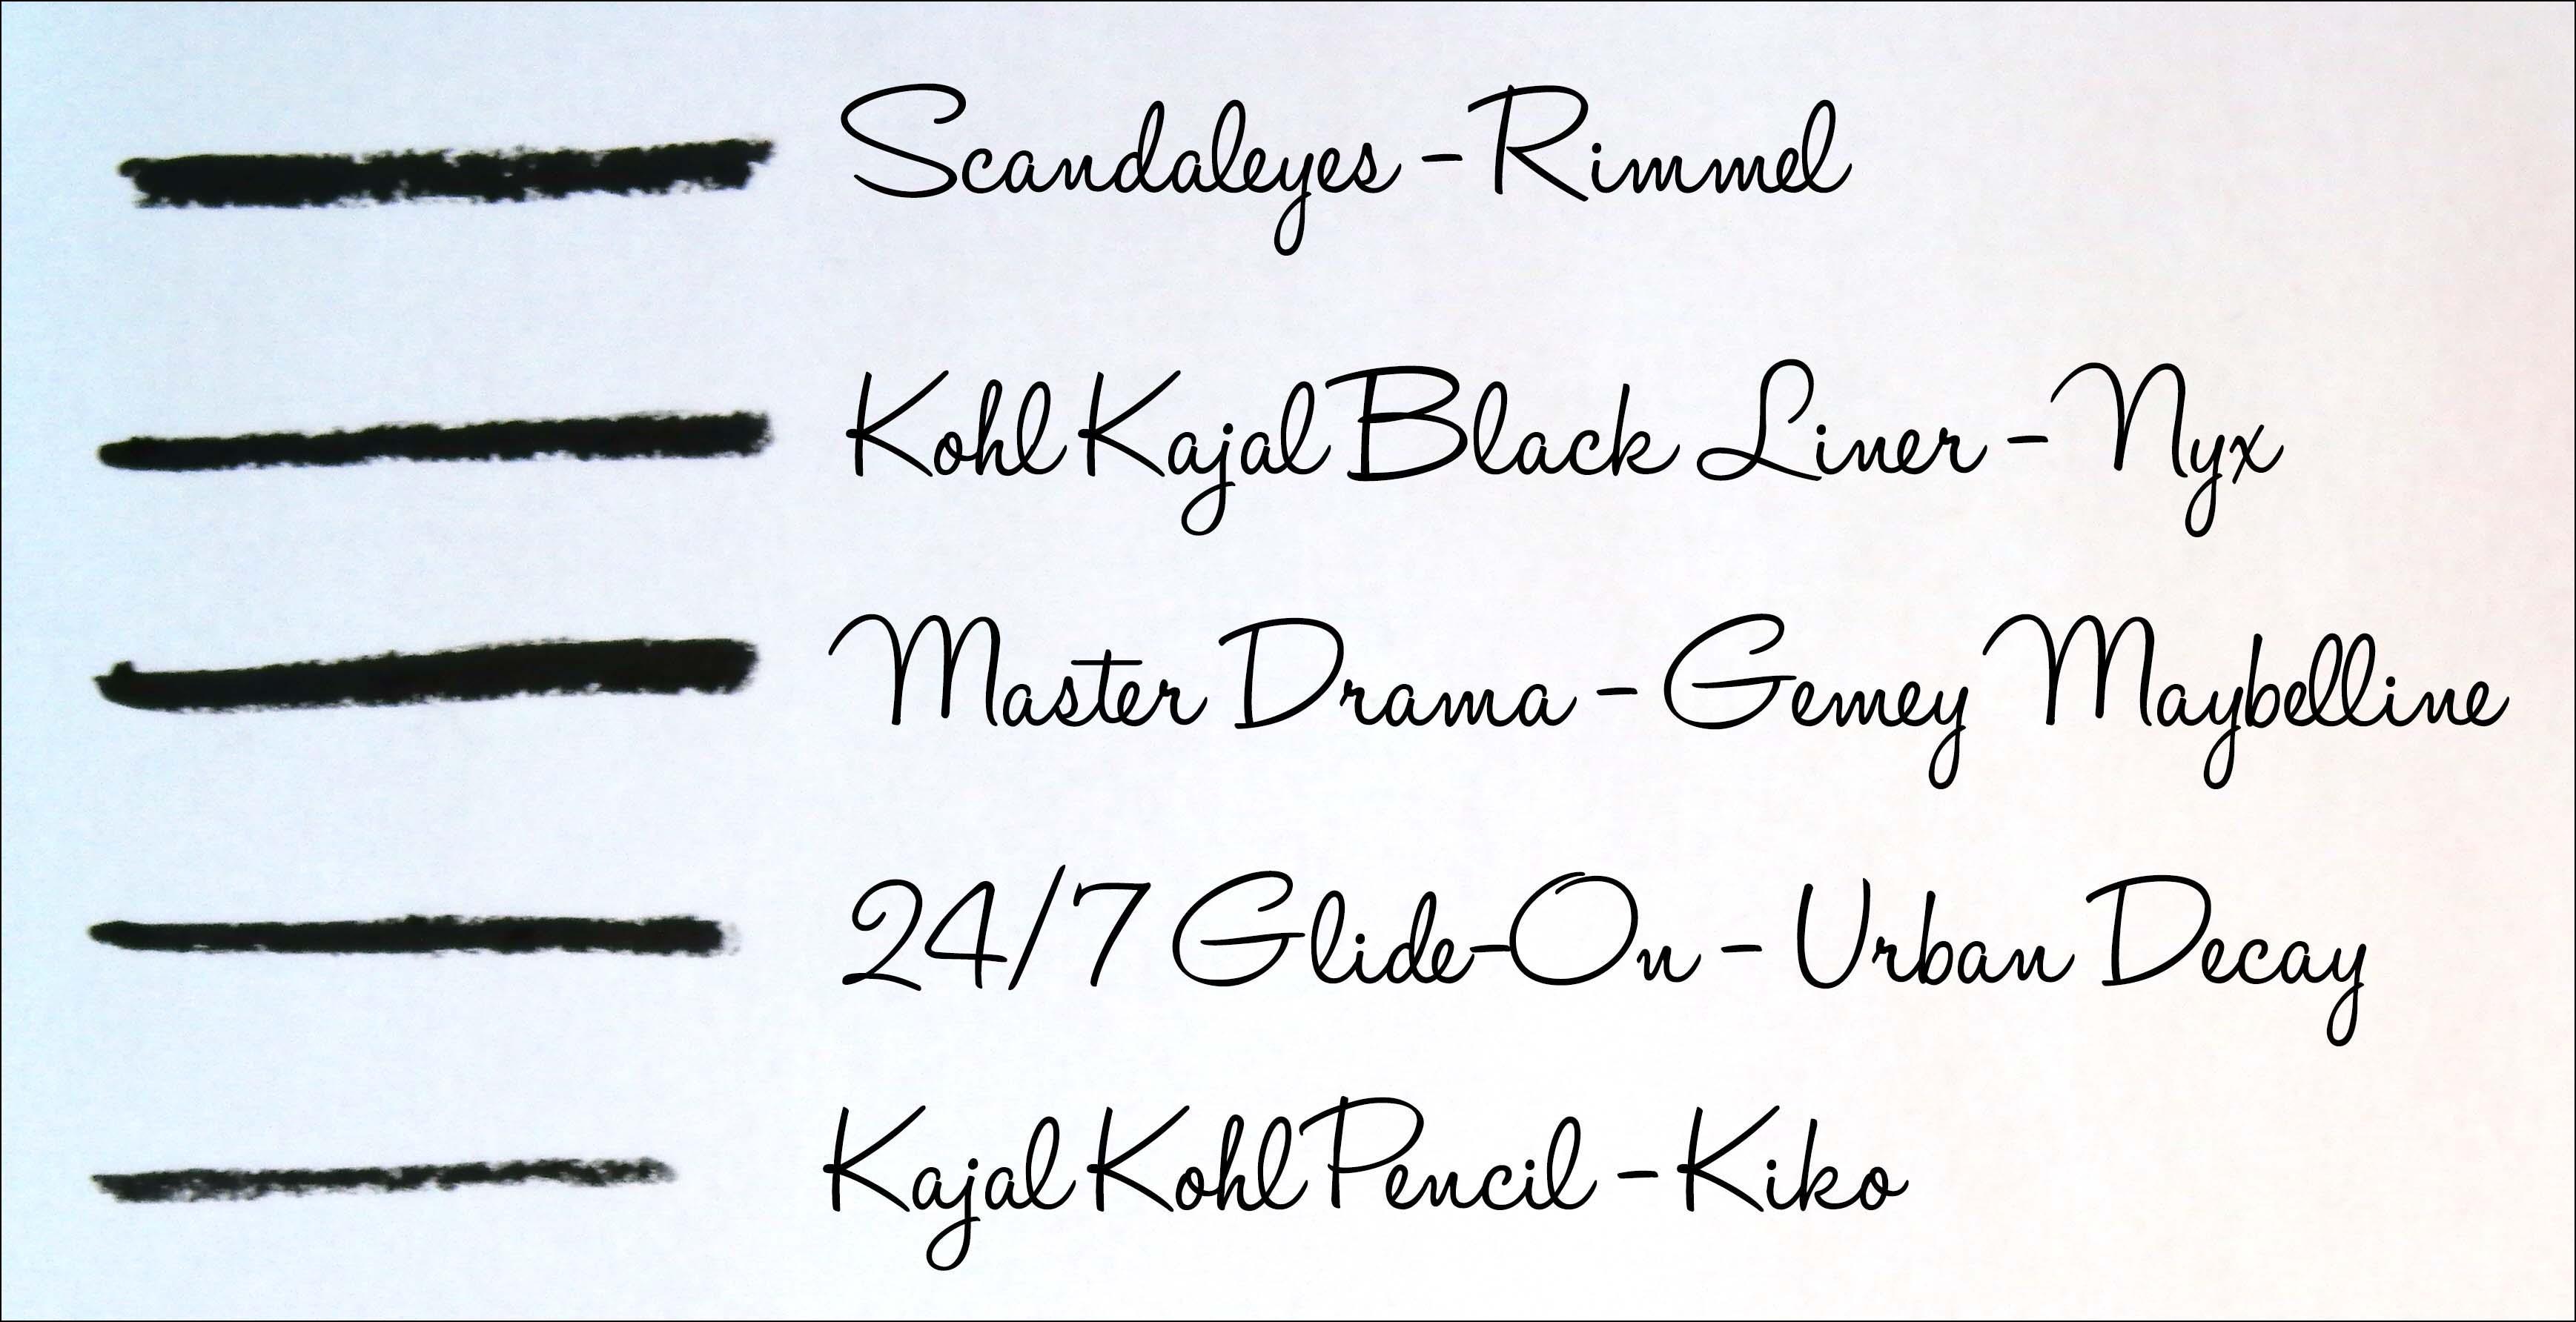 crayon noir, kajal, rimmel, scandaleyes, maybelline, master drama, kajal kiko, kajal nyx, liner, liner noir, urban decay